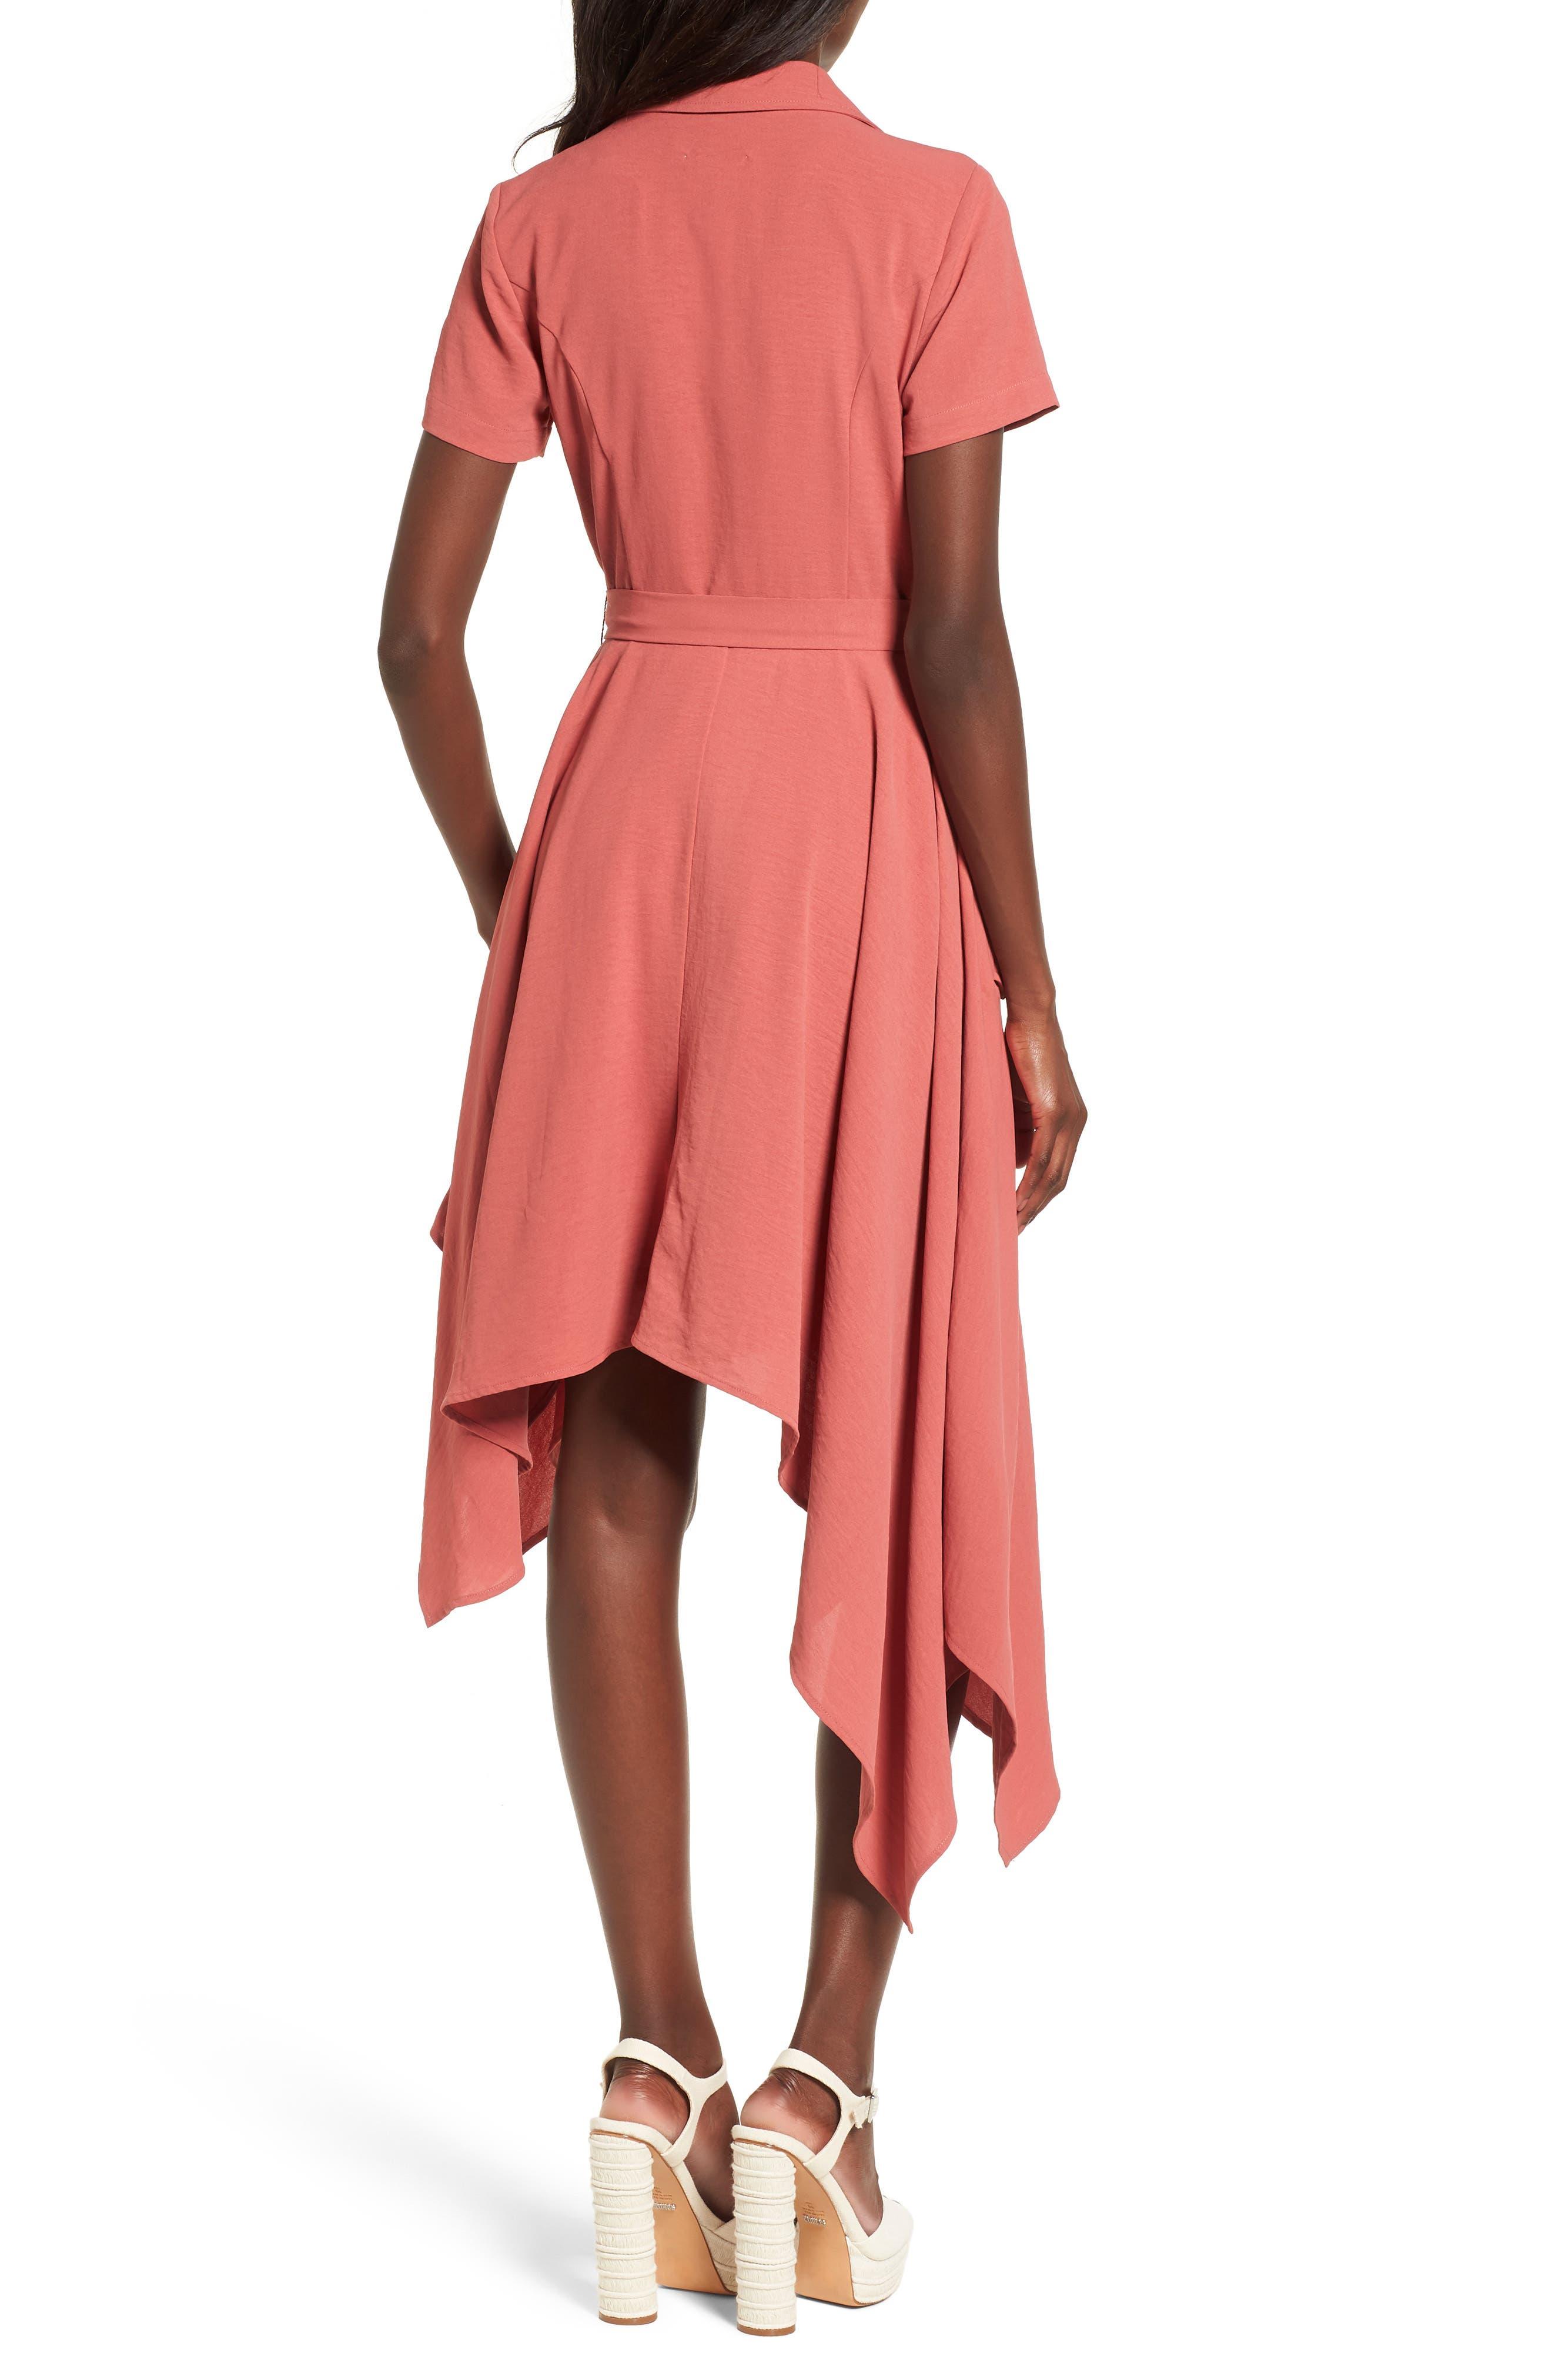 Chriselle x J.O.A. Asymmetrical Trench Dress,                             Alternate thumbnail 4, color,                             Patina